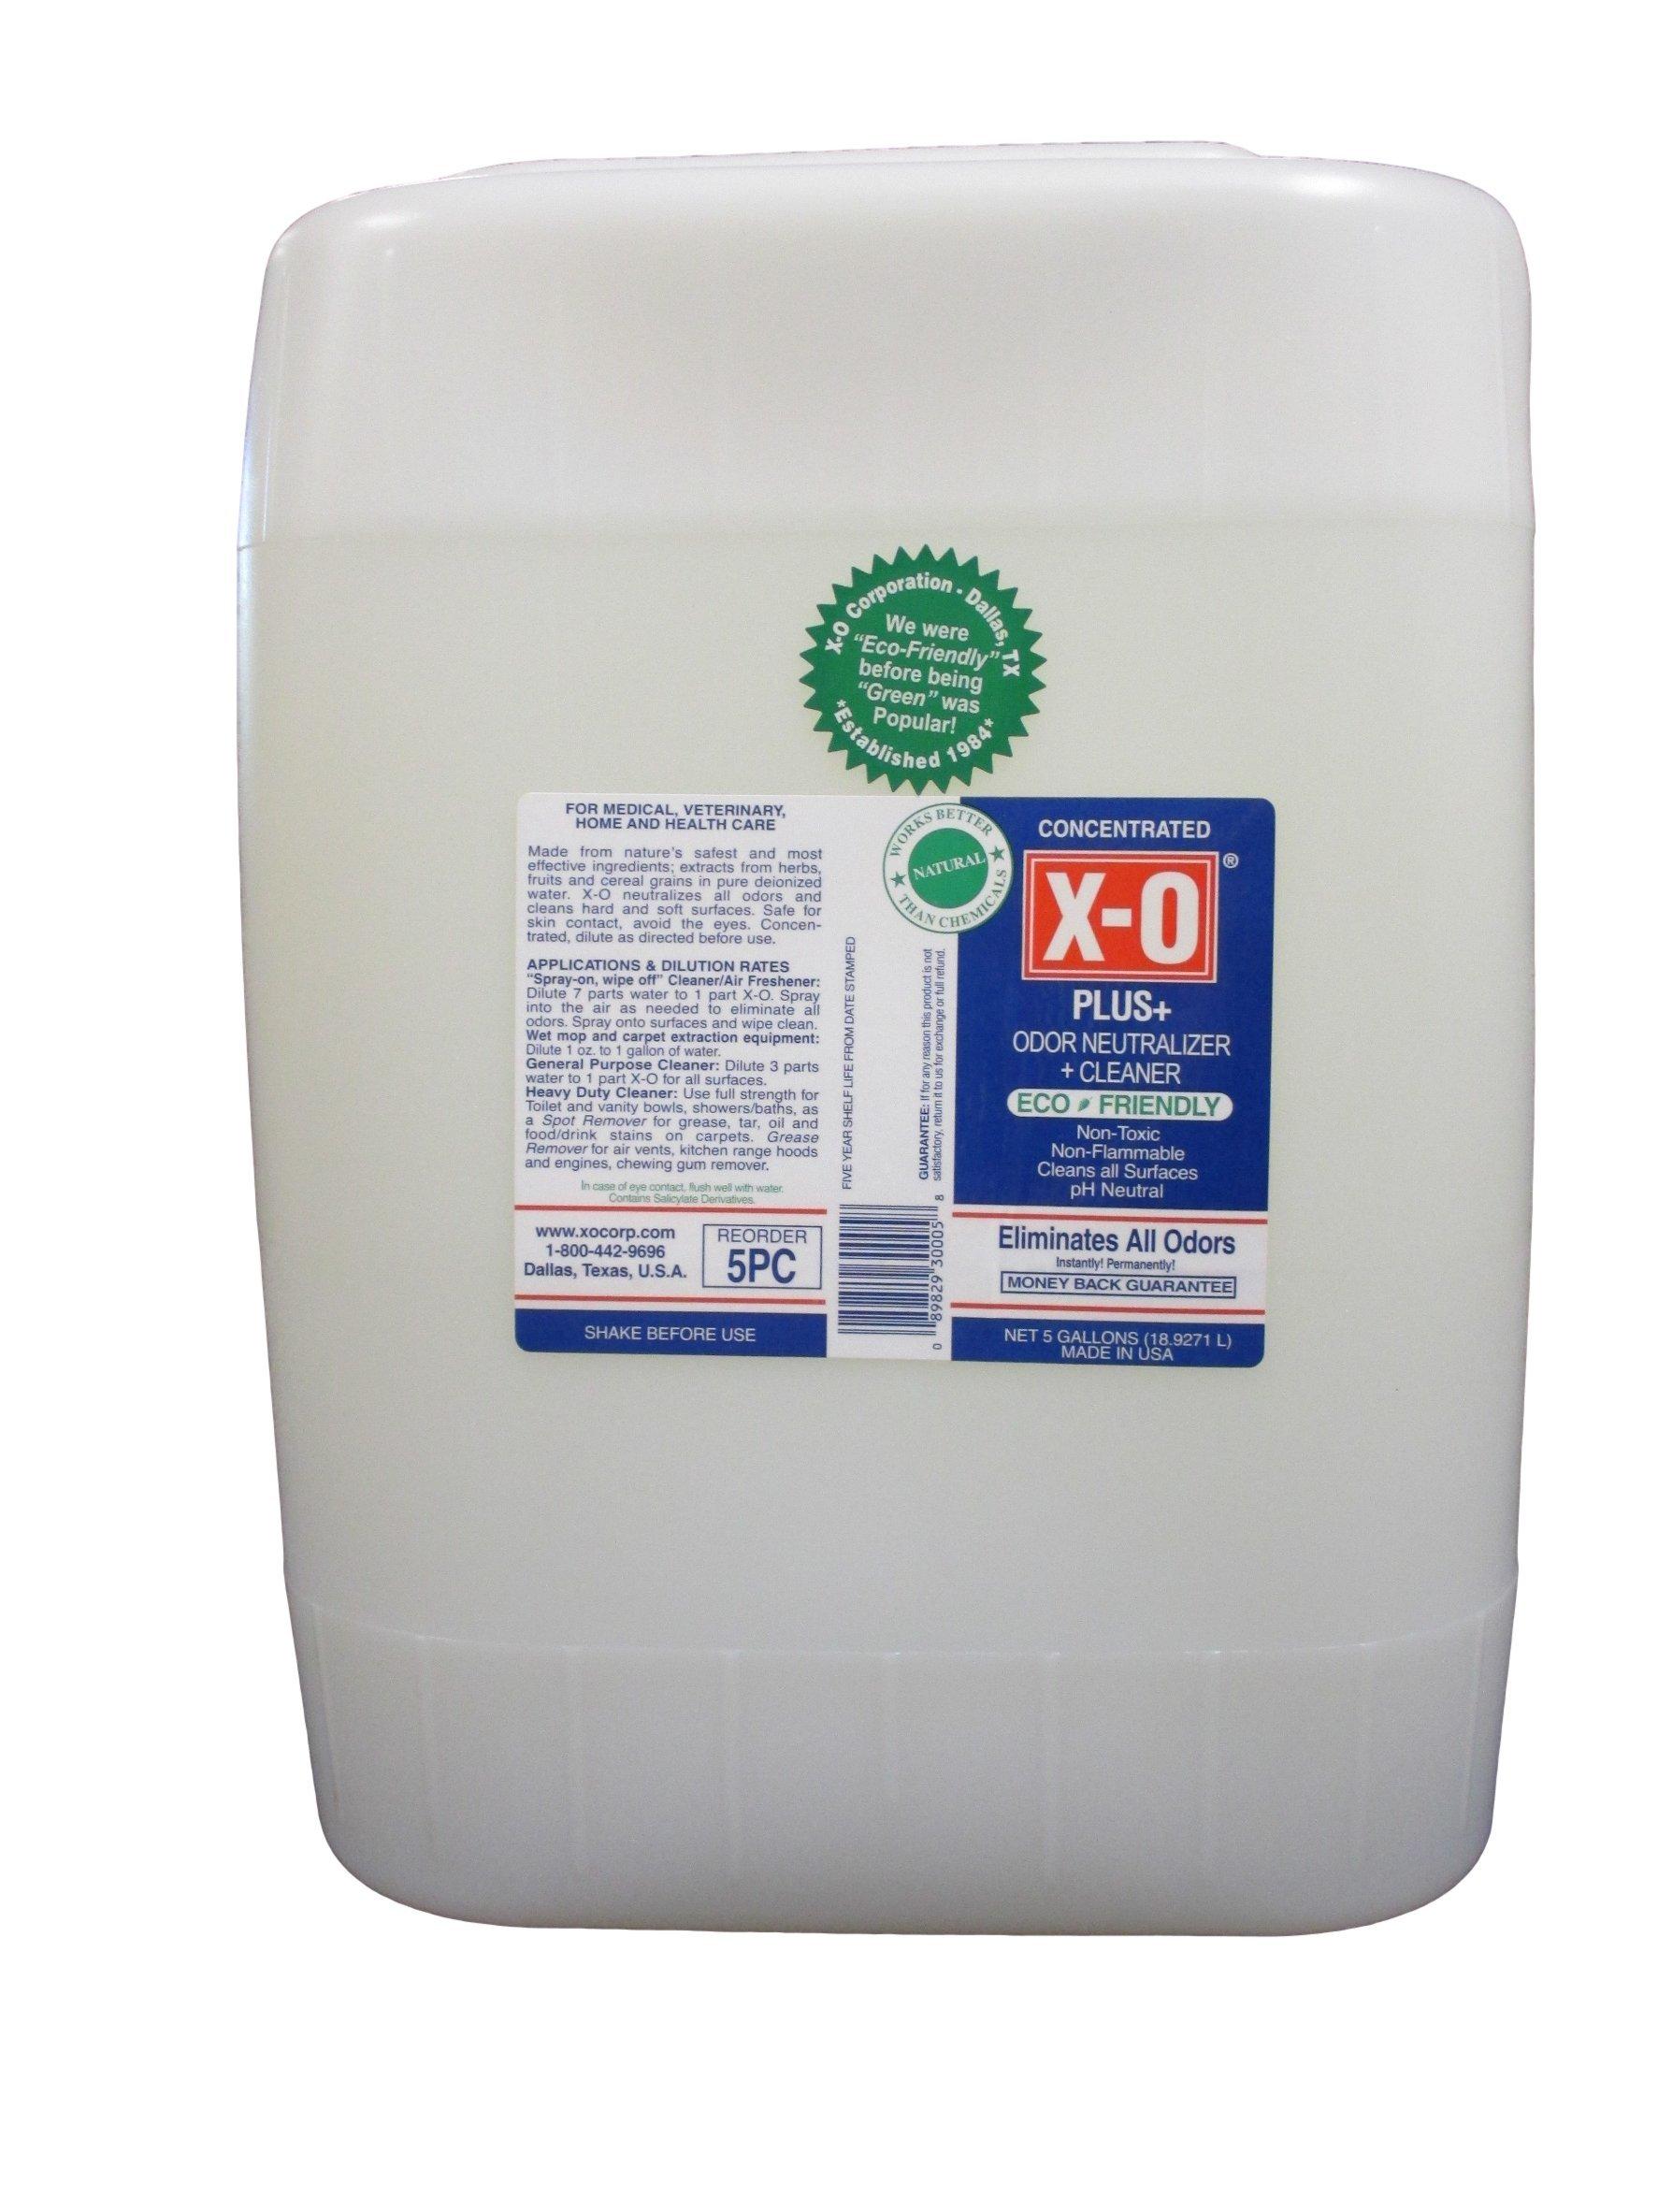 X-O Plus Odor Neutralizer/Cleaner, 5 gal, Clear